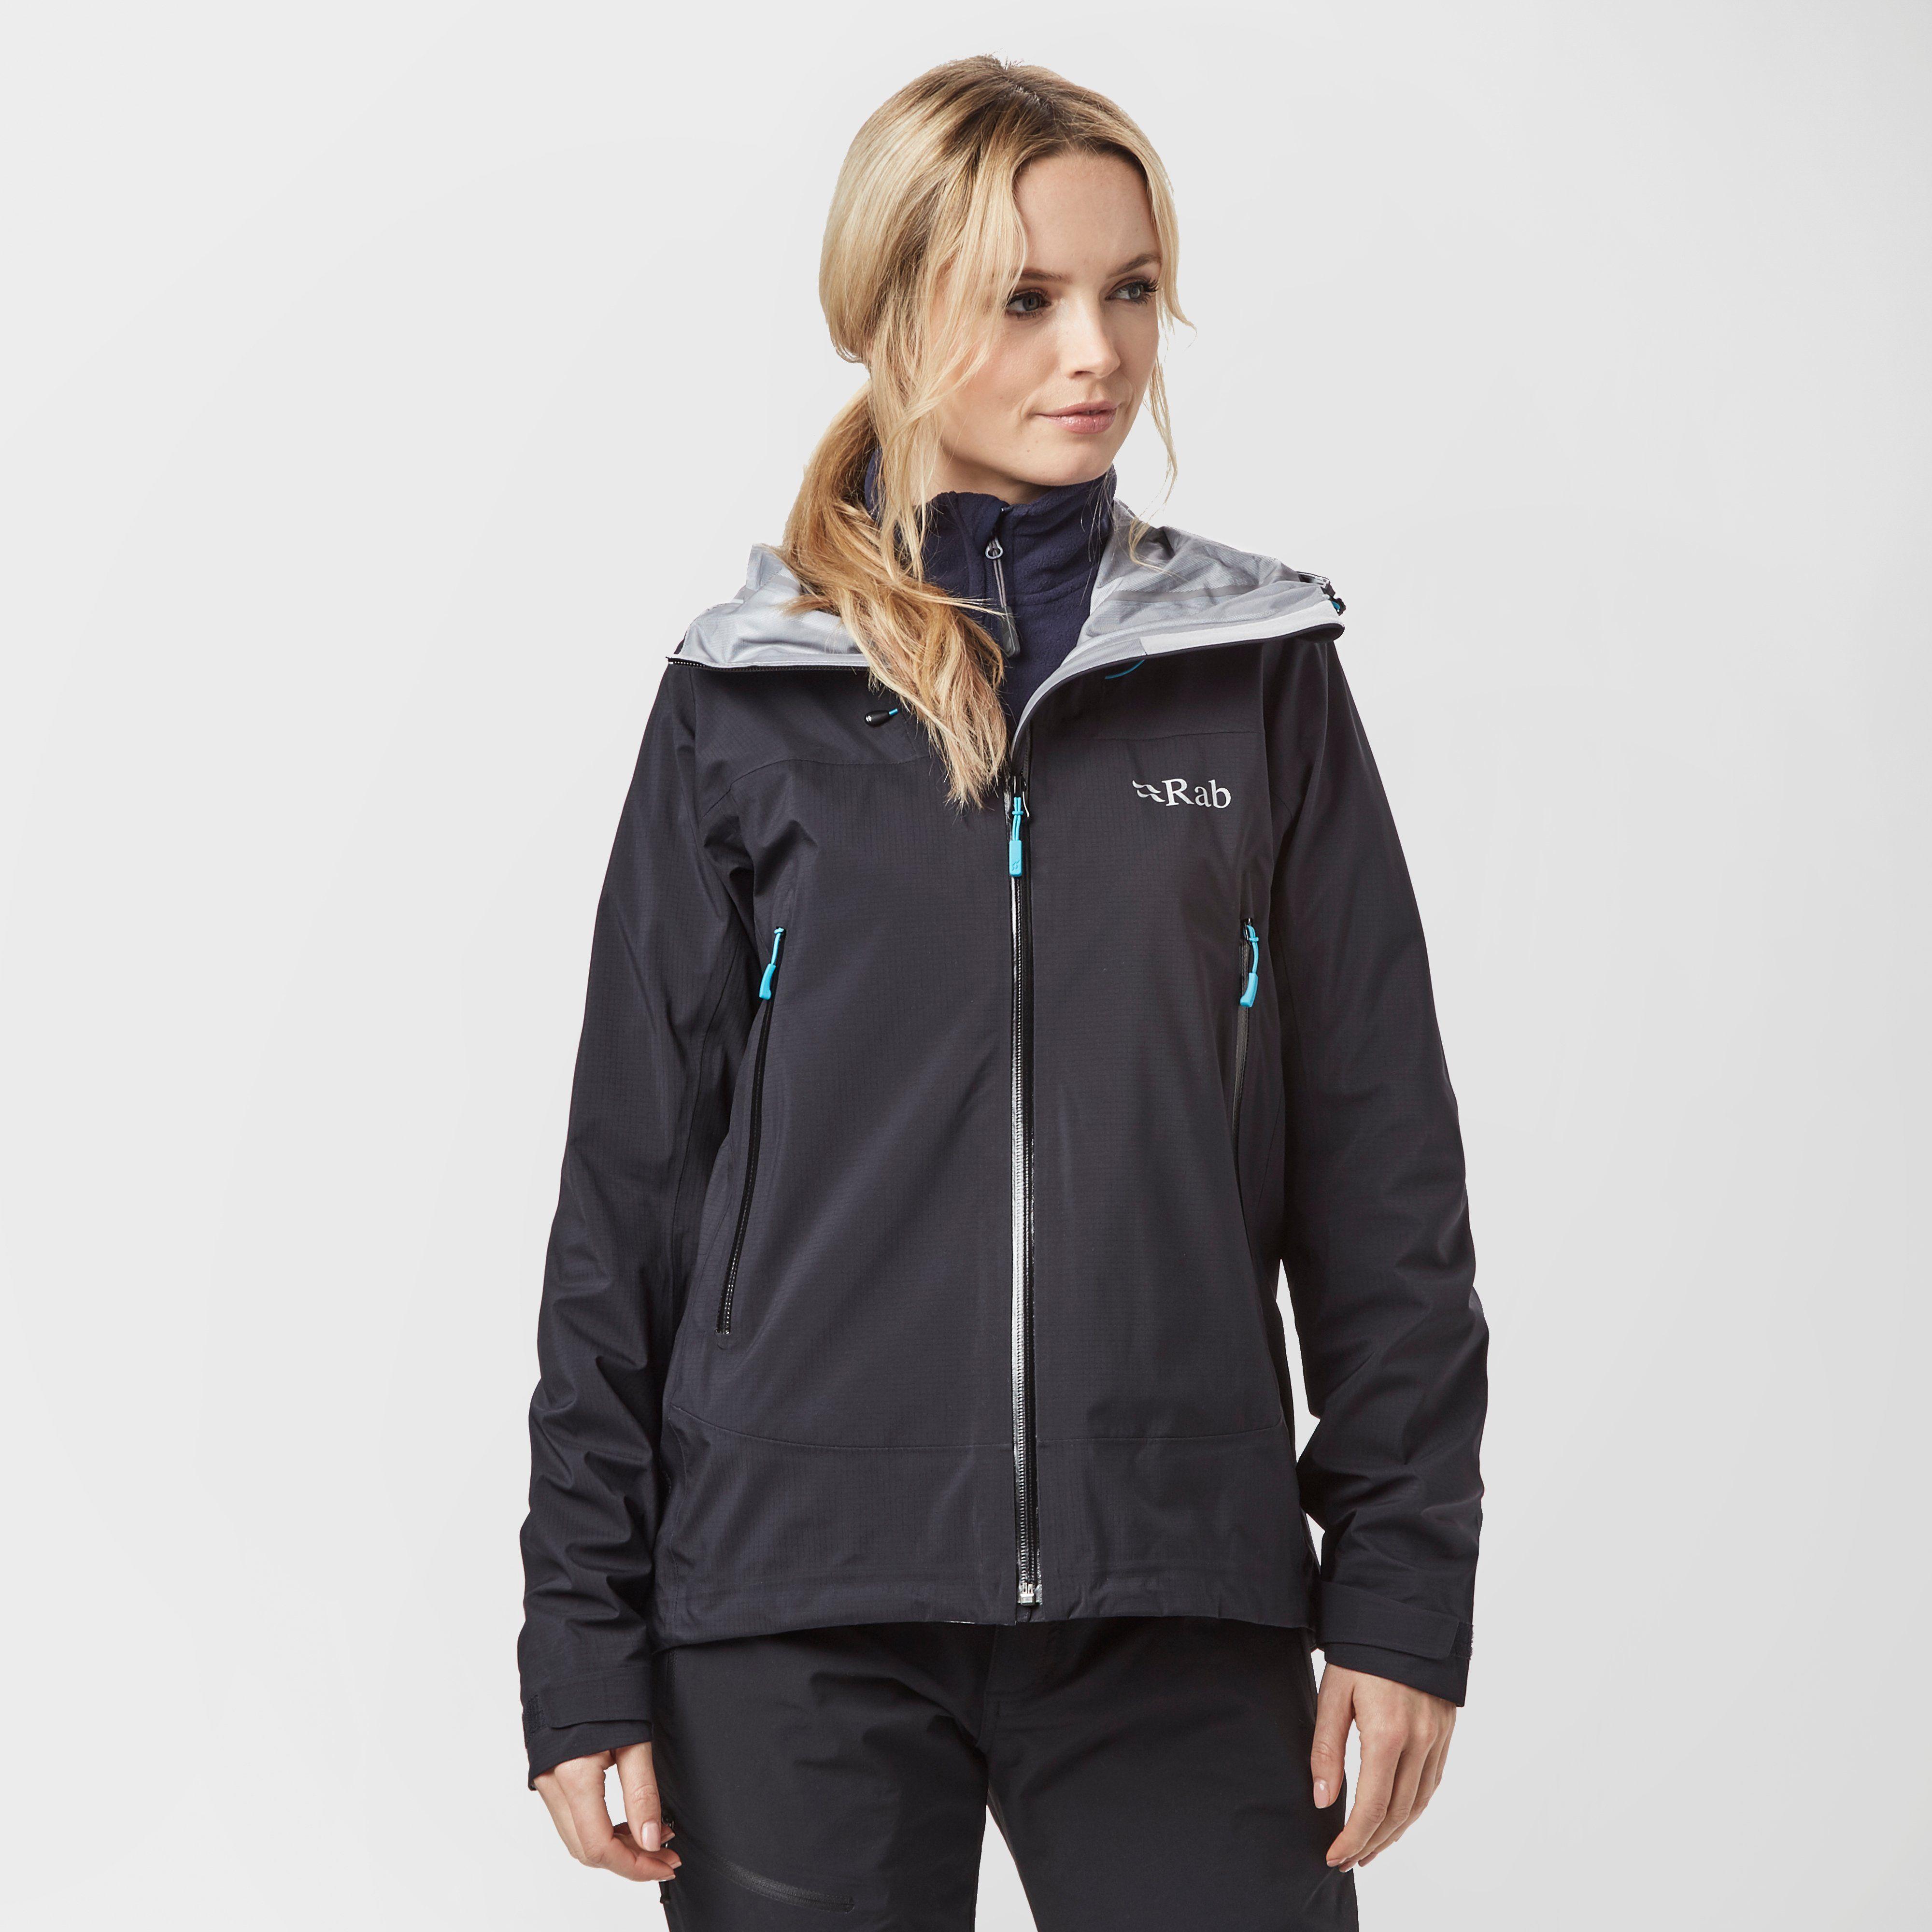 RAB Women's Waterproof Arc Jacket